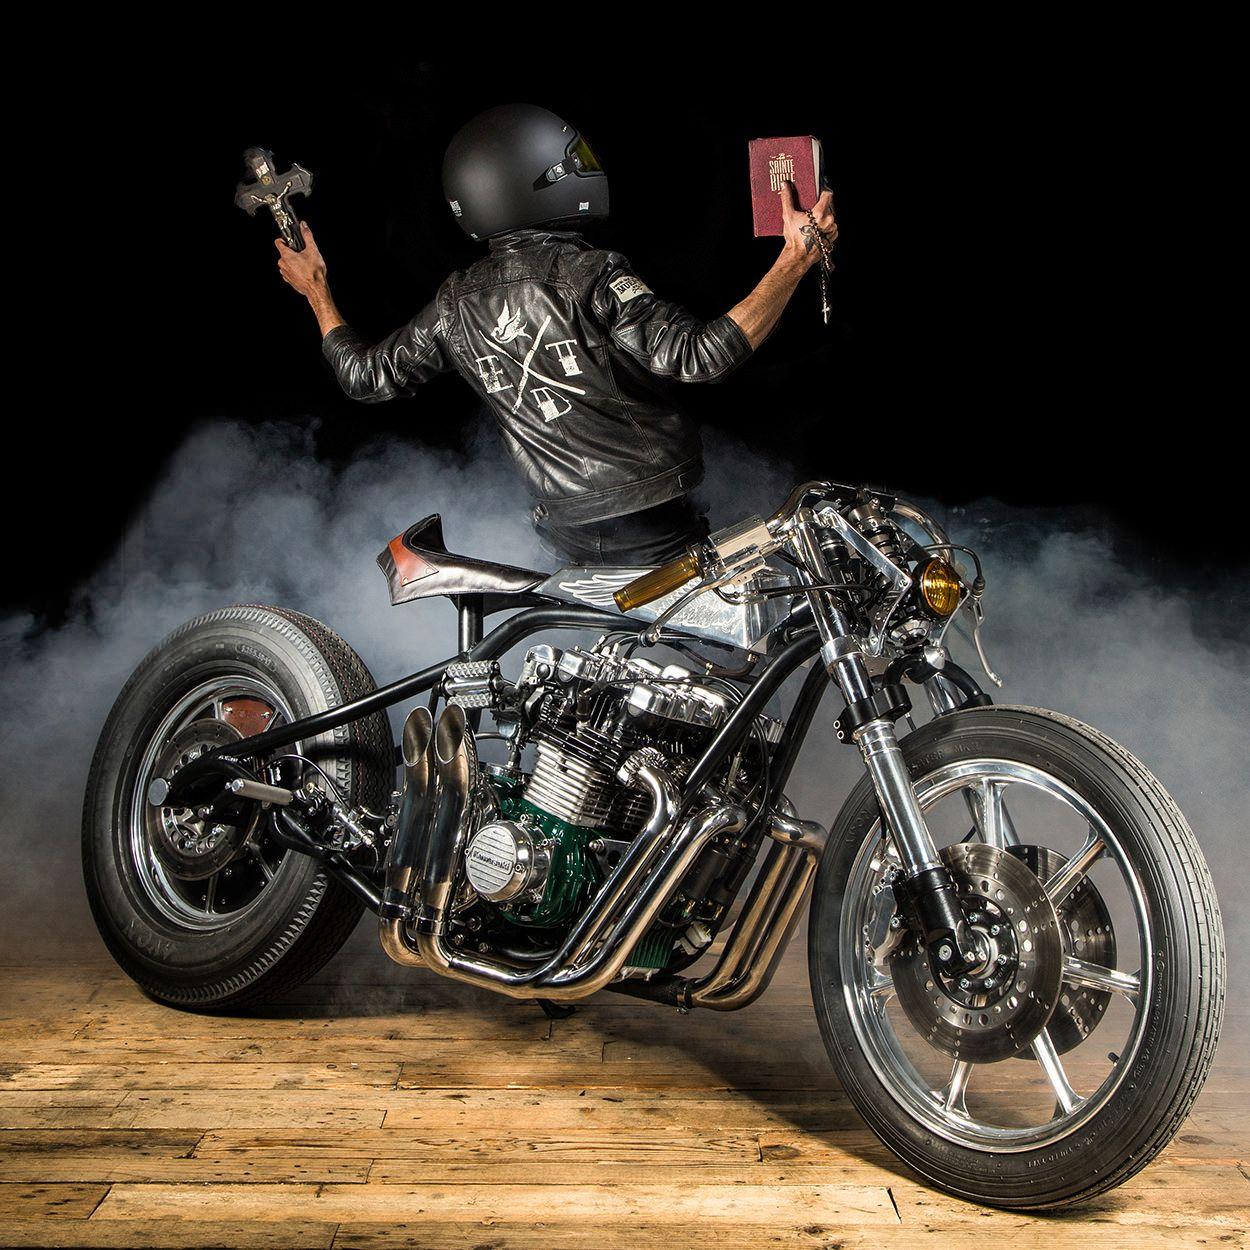 Sacrilege A Kawasaki Z1000st Of Biblical Proportions Kawasaki Cafe Racer Bike Exif Cool Bikes [ 1250 x 1250 Pixel ]